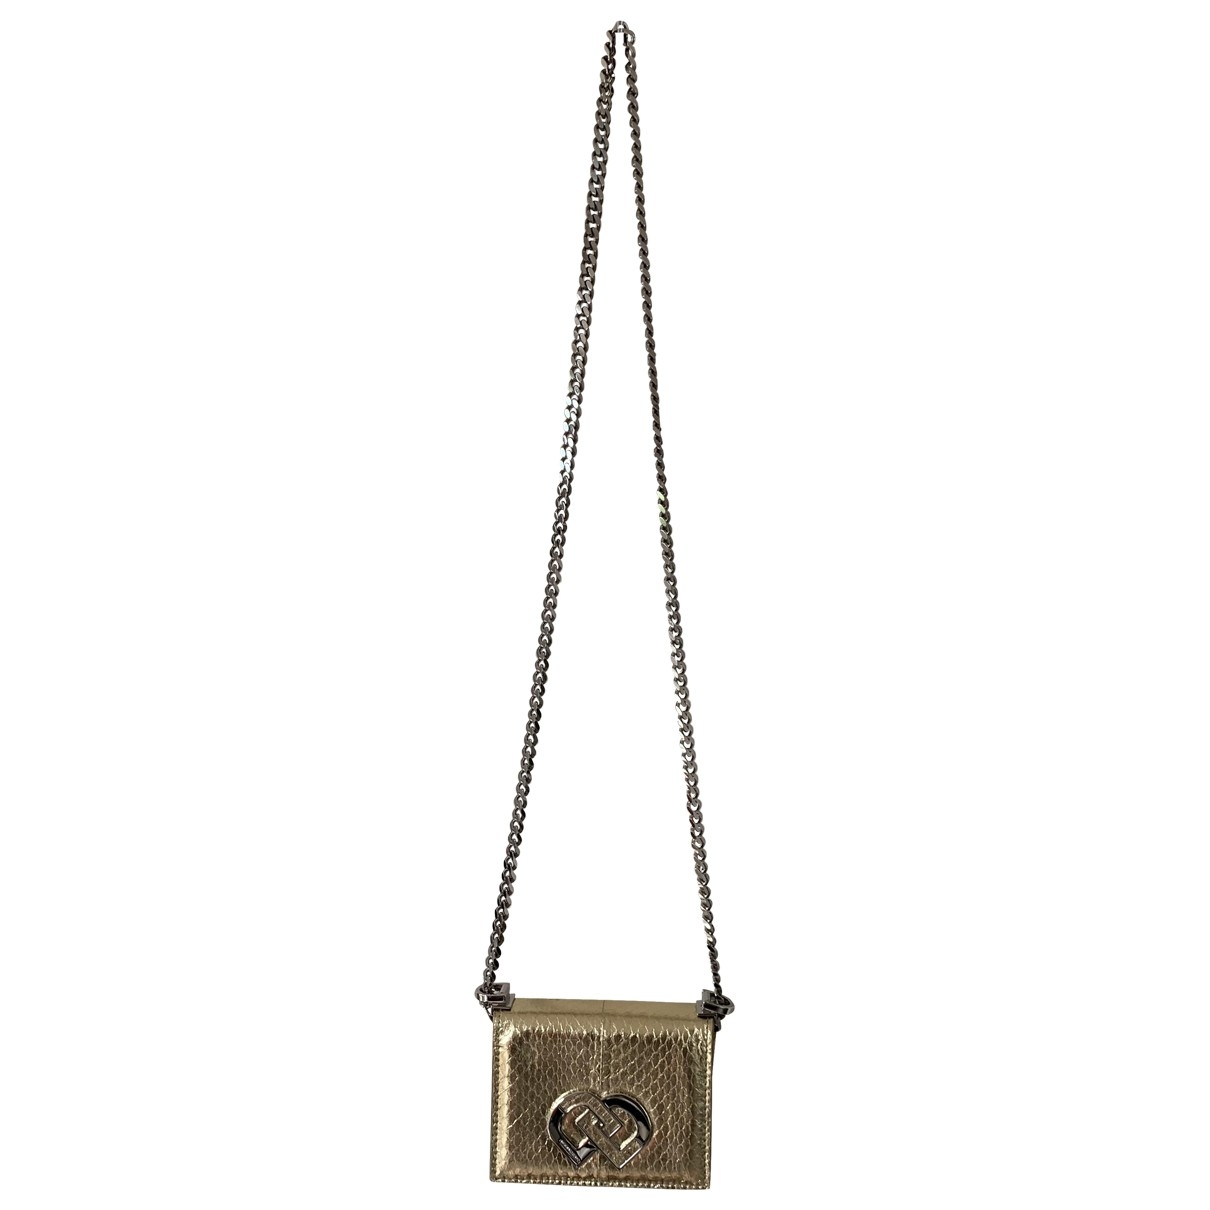 Dsquared2 \N Gold Leather handbag for Women \N